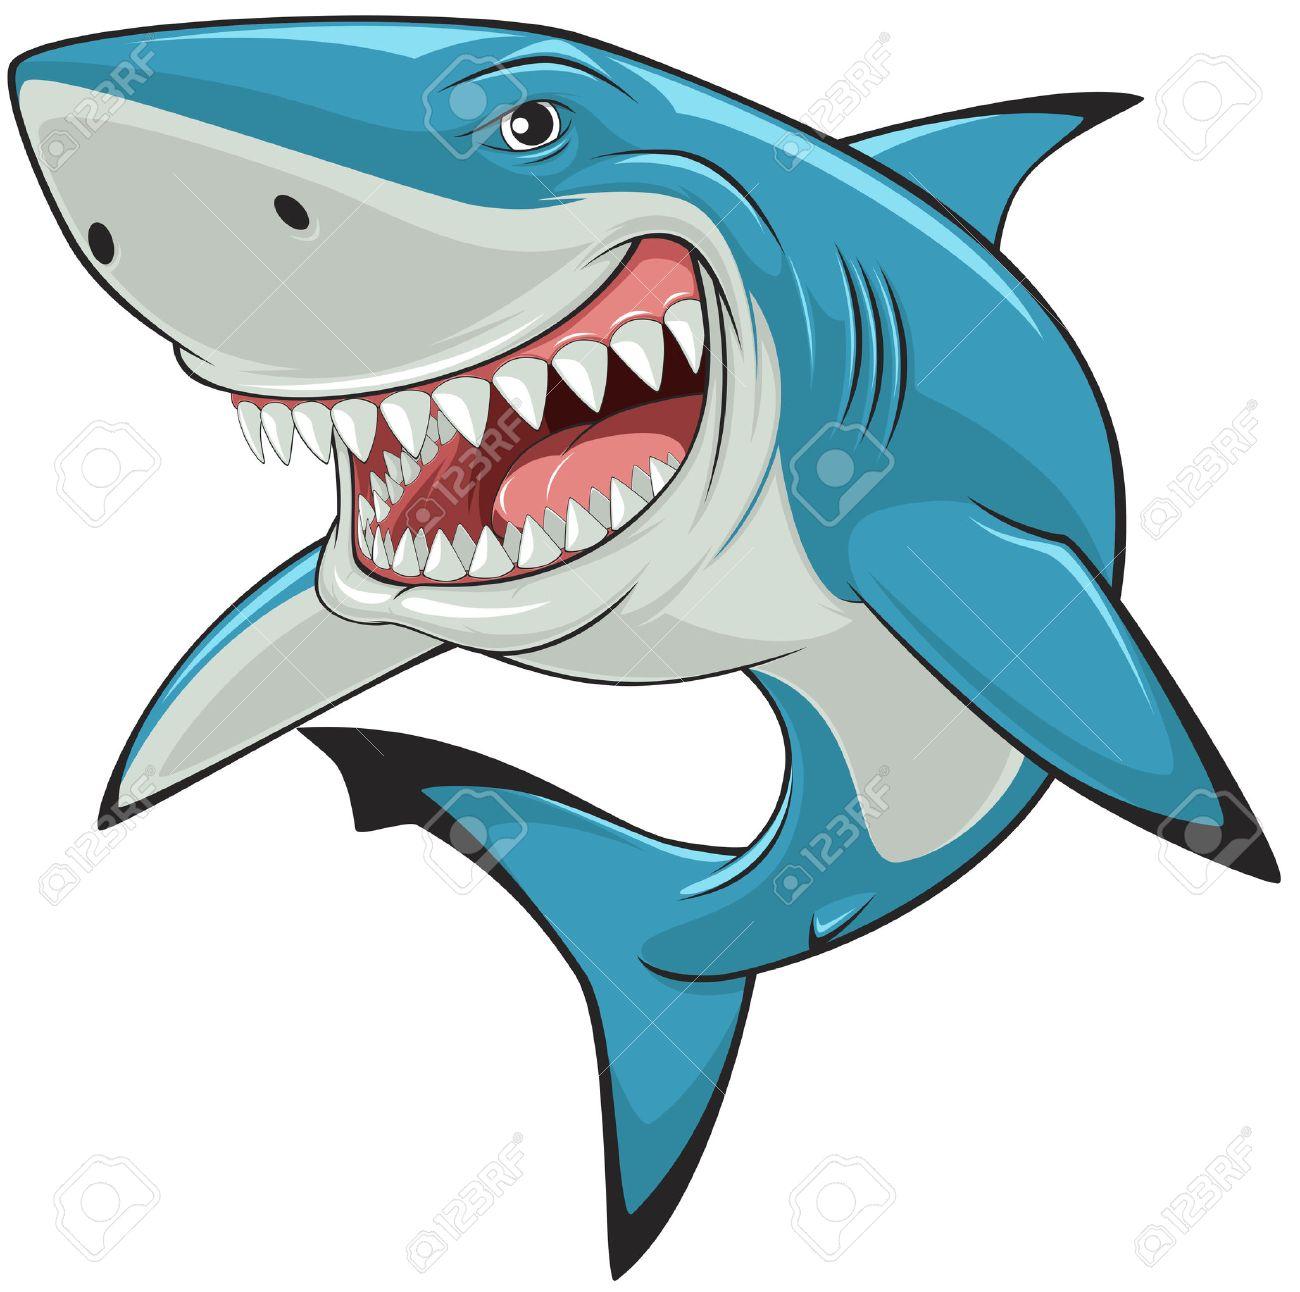 7 690 cartoon shark cliparts stock vector and royalty free cartoon rh 123rf com cartoon shark clipart free shark fin clipart free